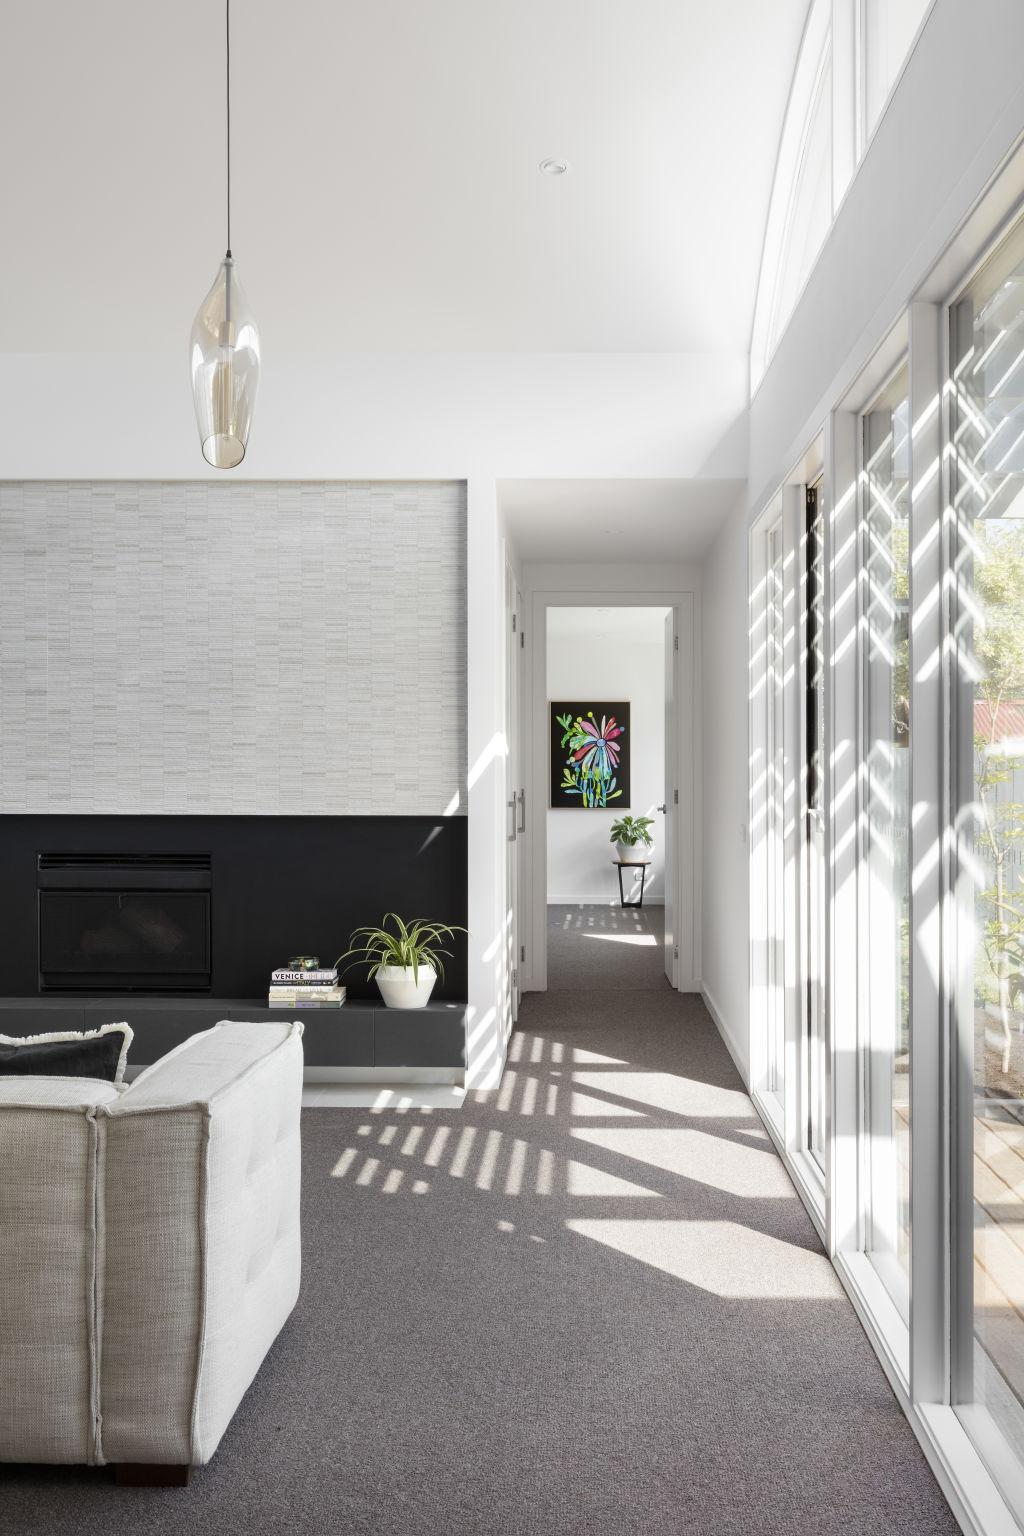 A Fasham design provides depth of sunlight, illuminating a living room and passage.